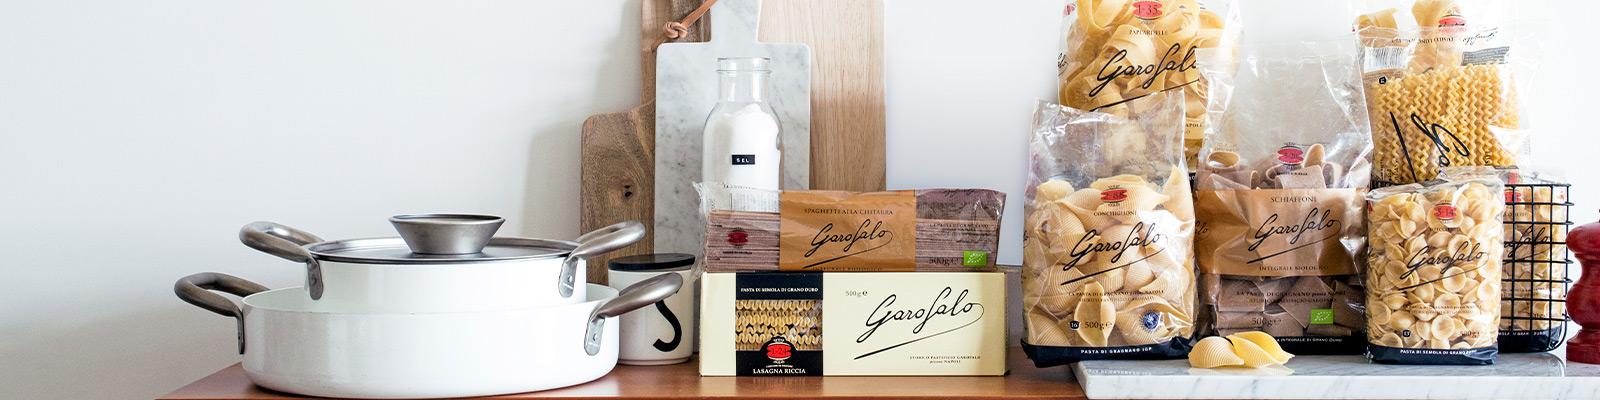 Pasta Garofalo - Formats spéciaux